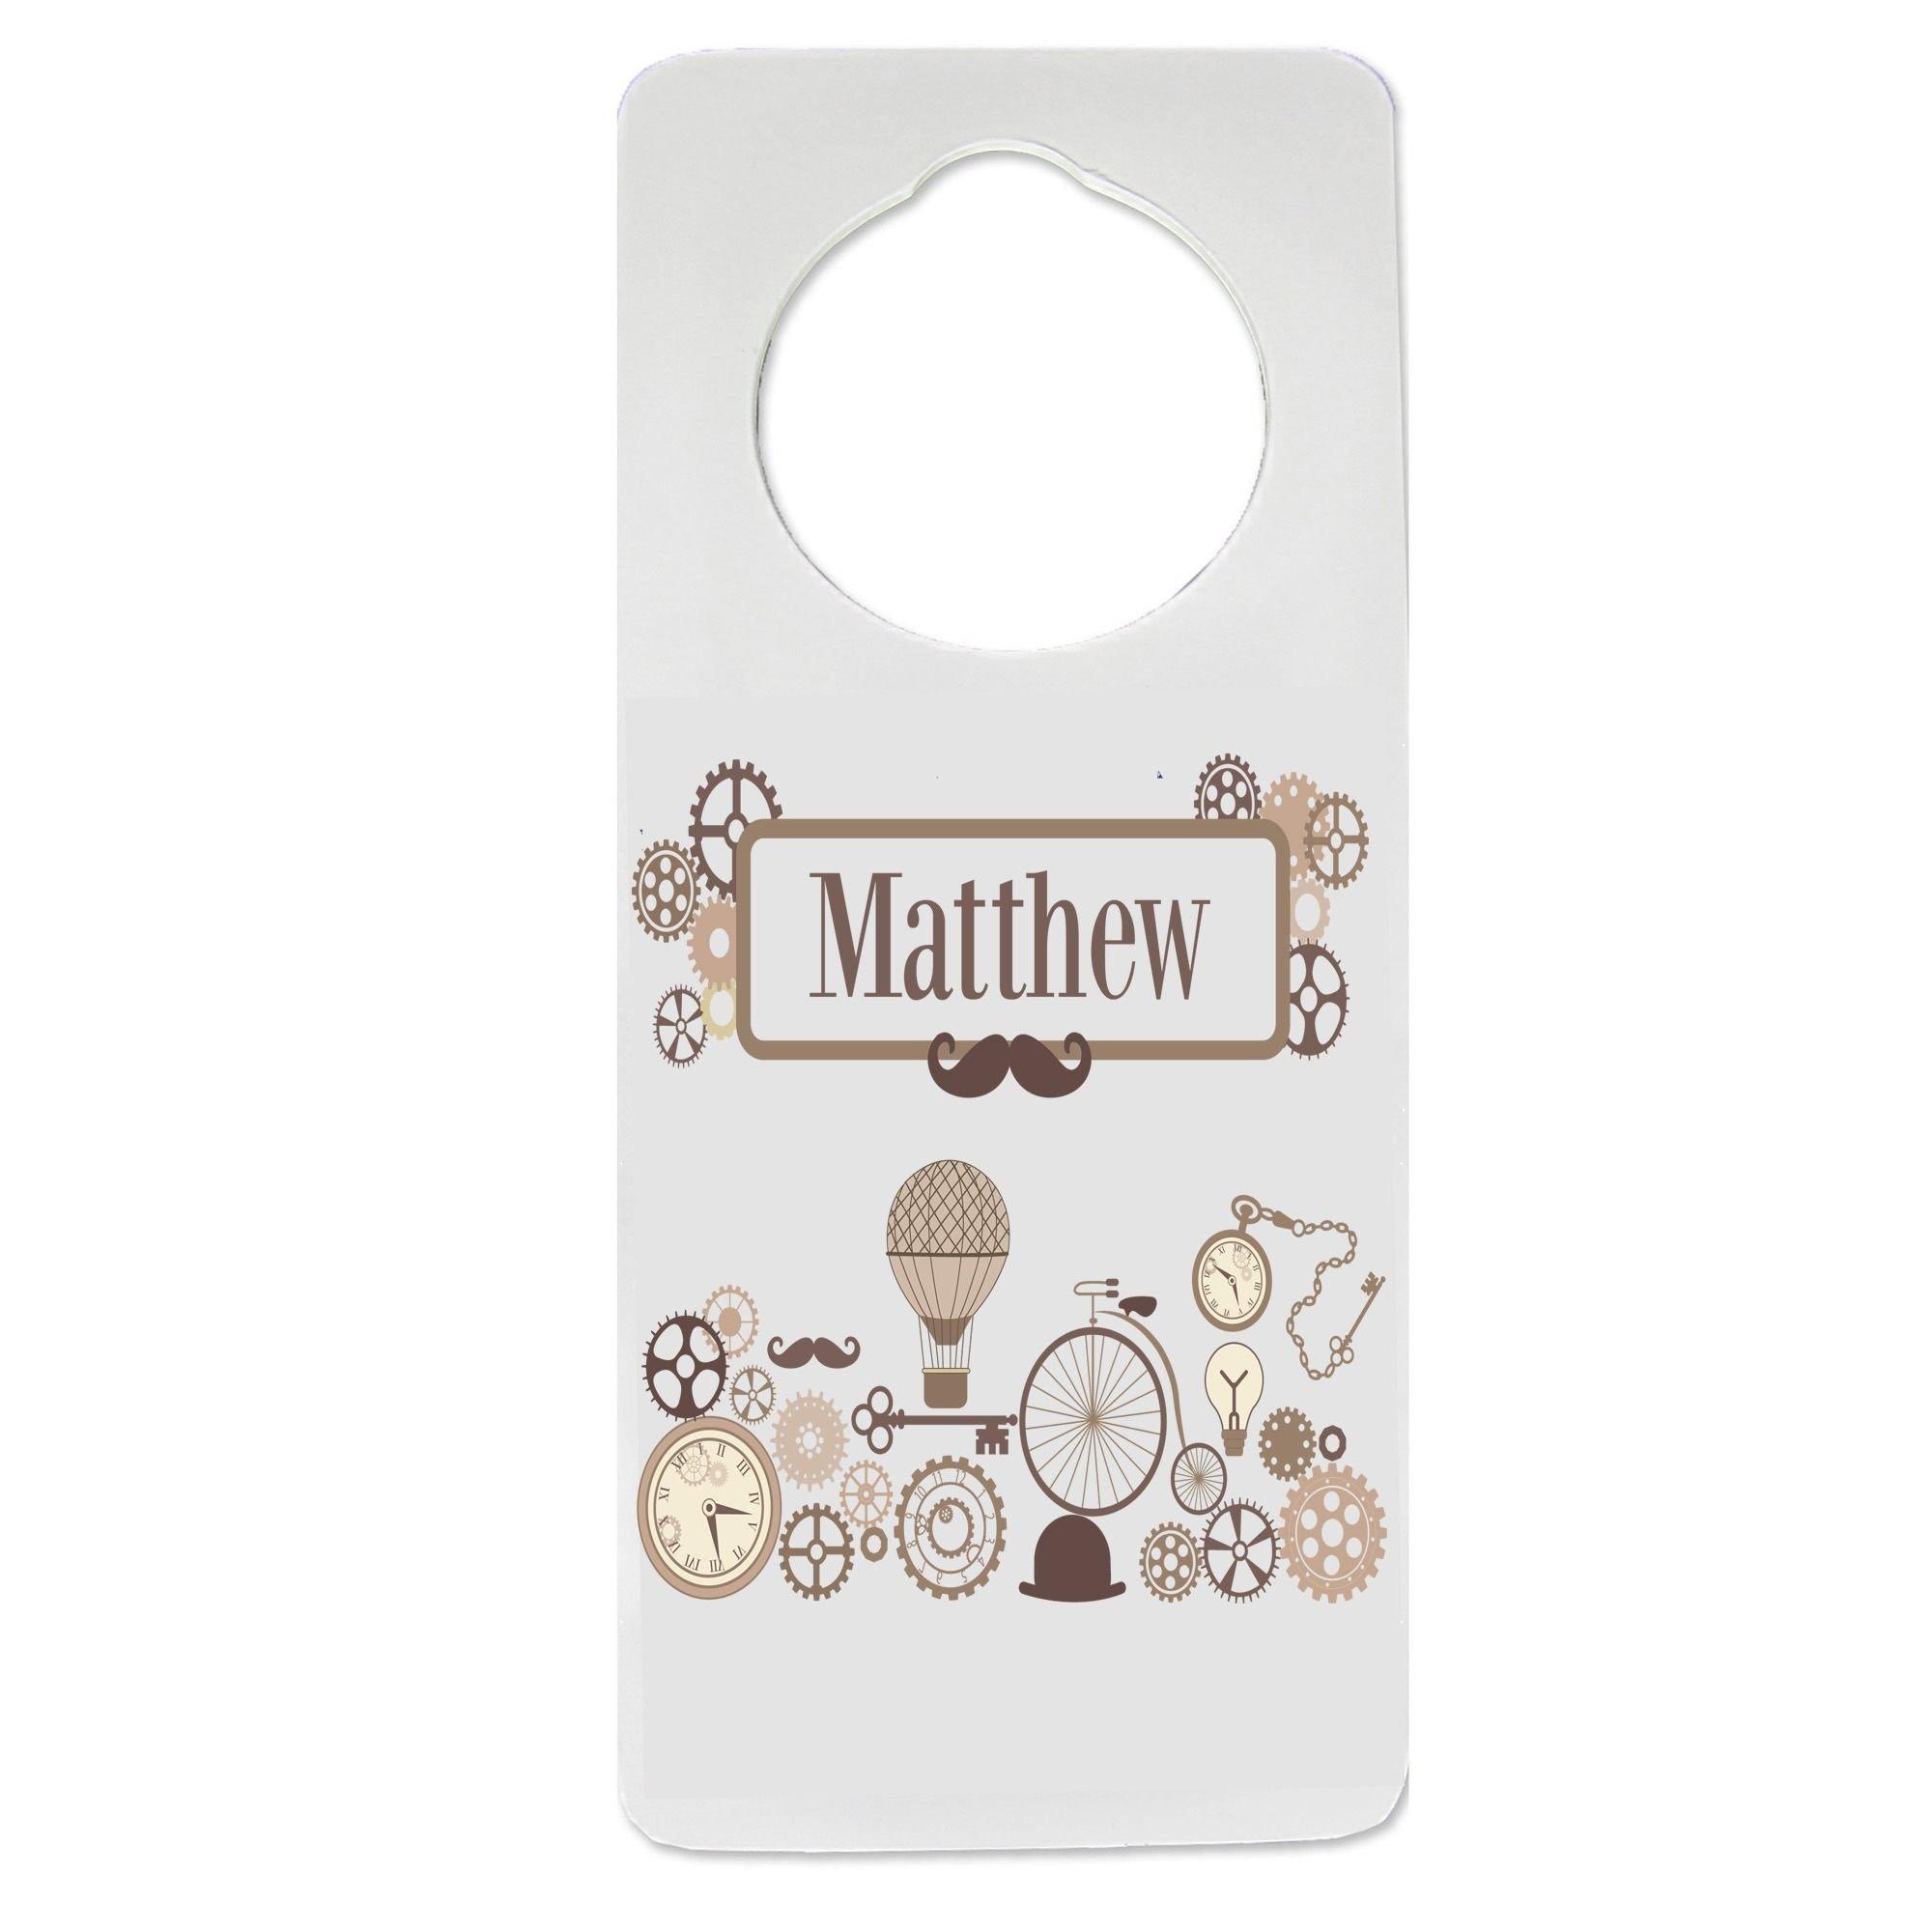 Personalized Steampunk Nursery Door Hanger